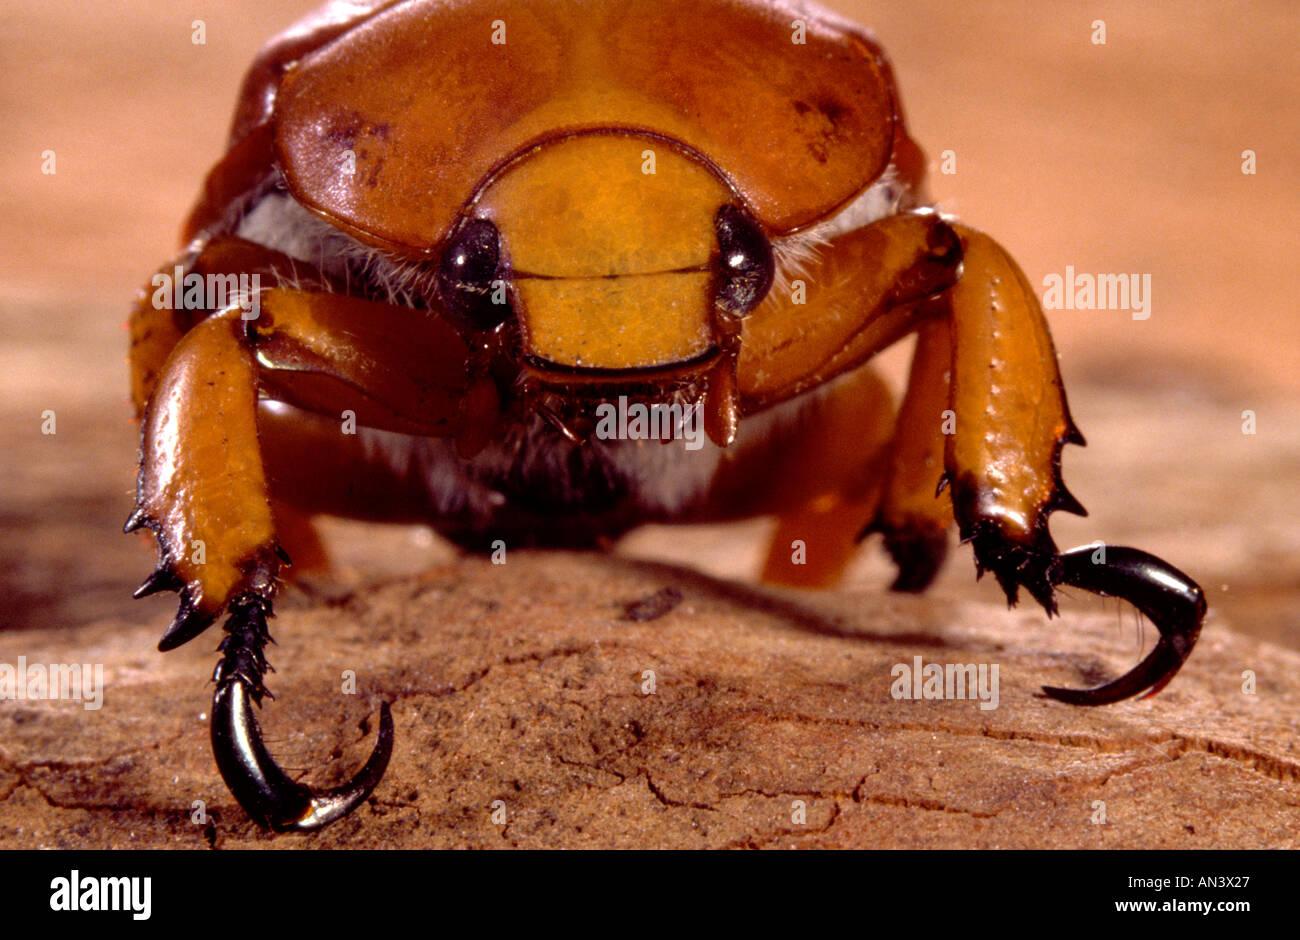 Australian Christmas Beetle.Australian Christmas Beetle Close Up Stock Photo 5029414